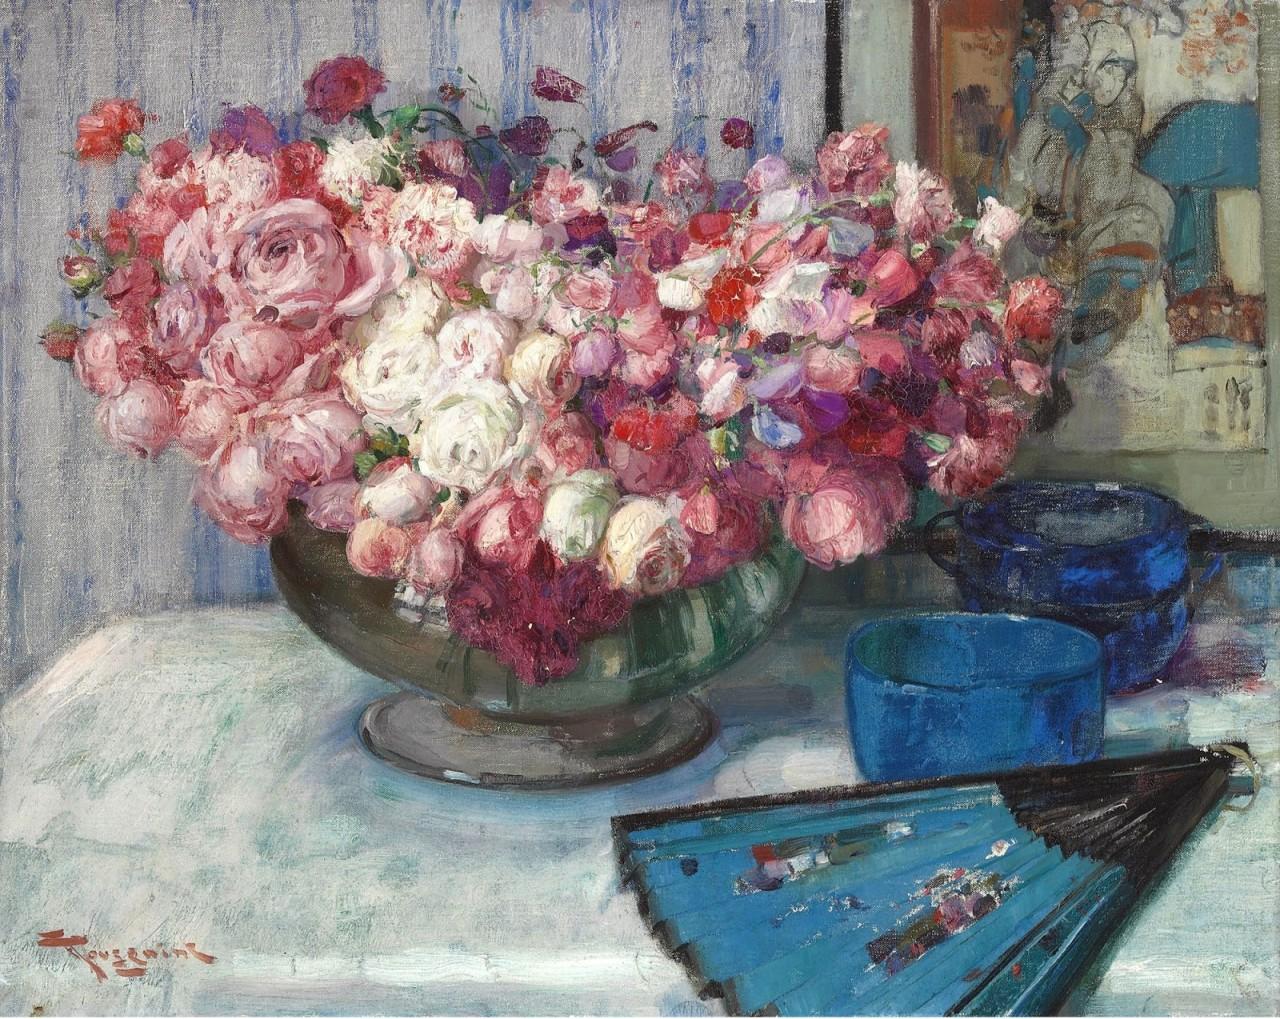 Фернан Туссен (Fernand Toussaint), 1873 - 1956. Бельгия